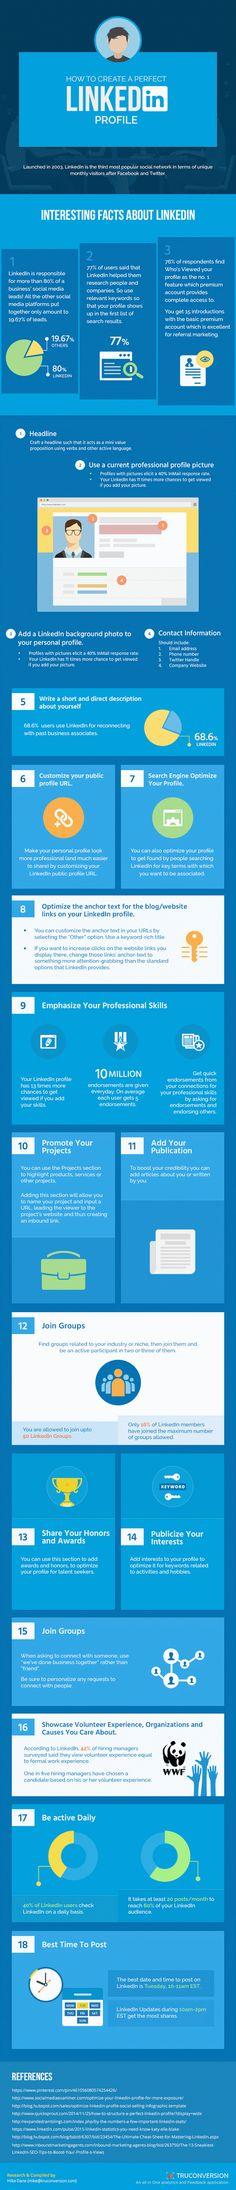 Tips To Create A Perfect LinkedIn Profile